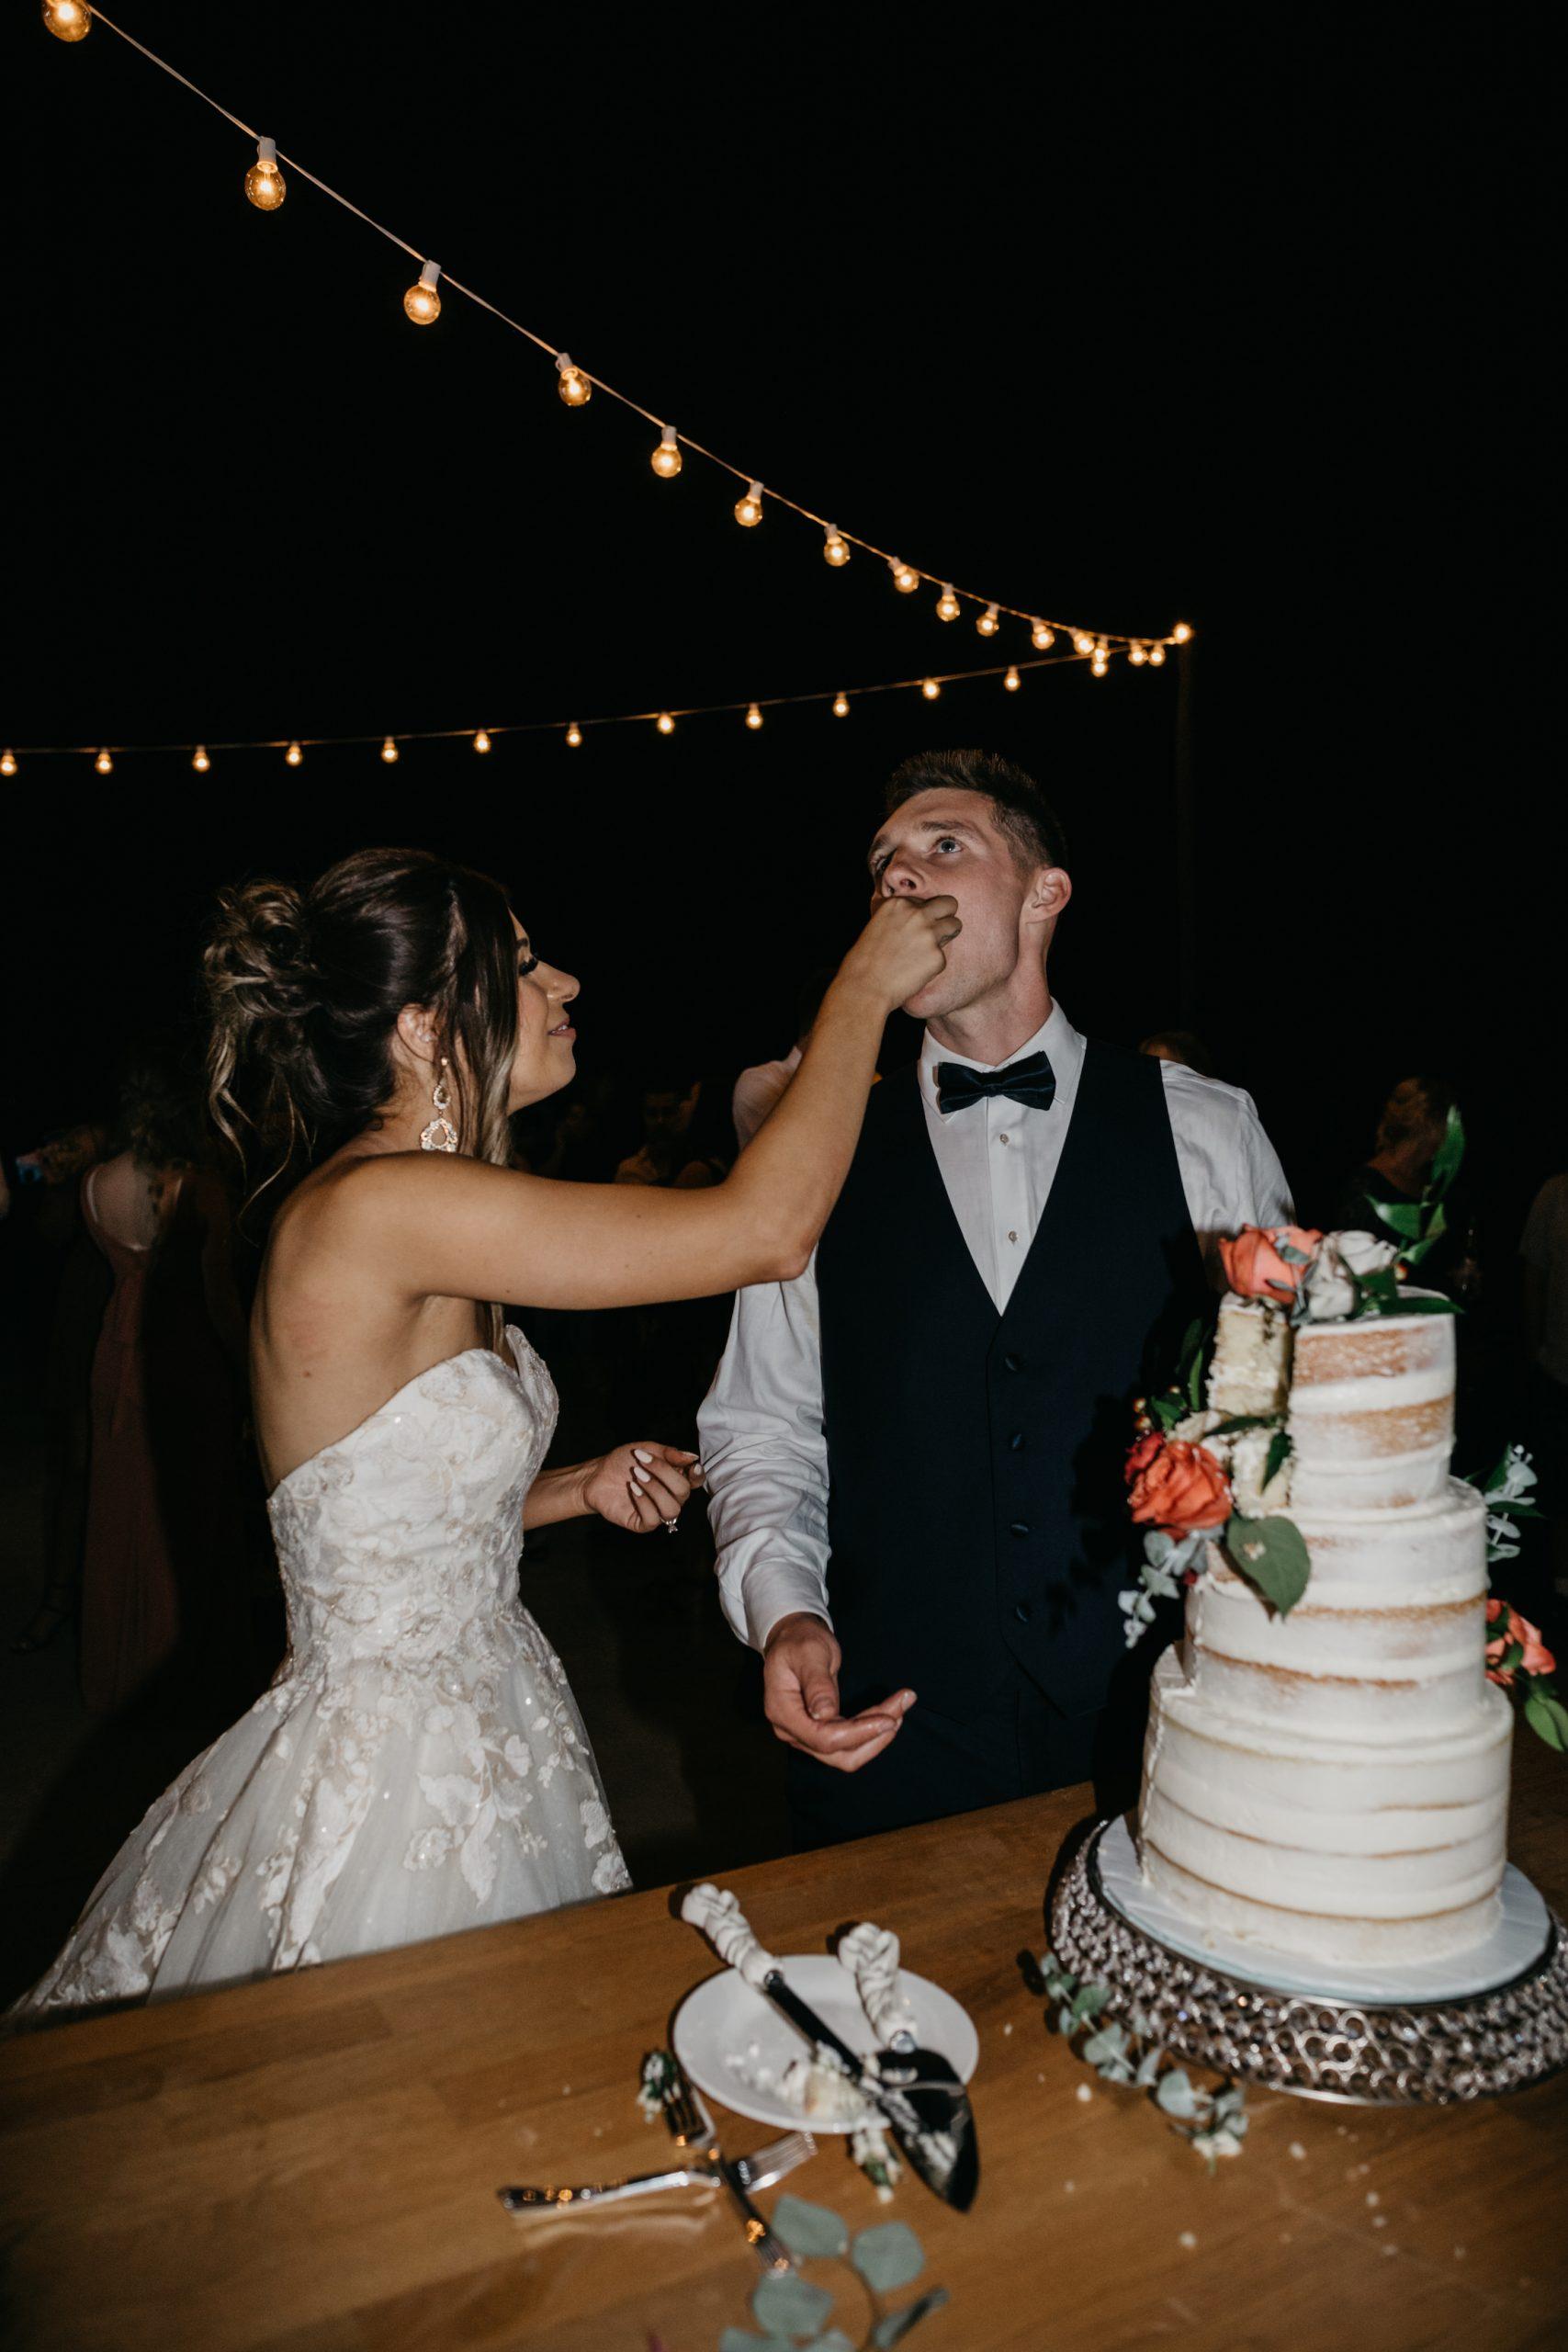 Bride and groom cut cake, image by Fatima Elreda Photo